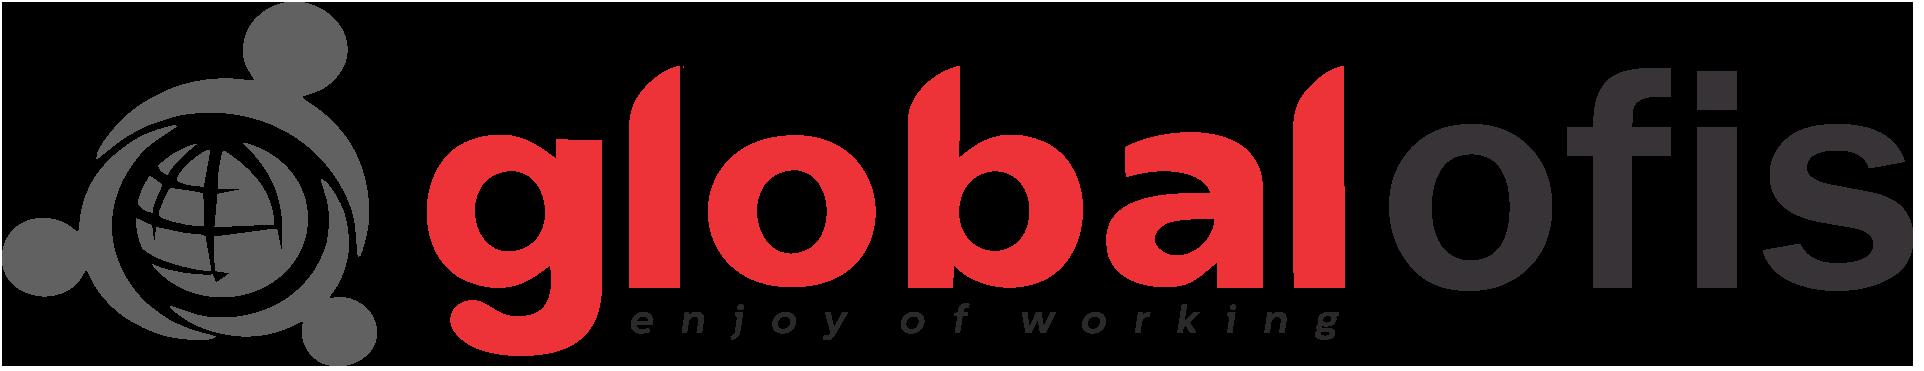 Global Sanal Ofis